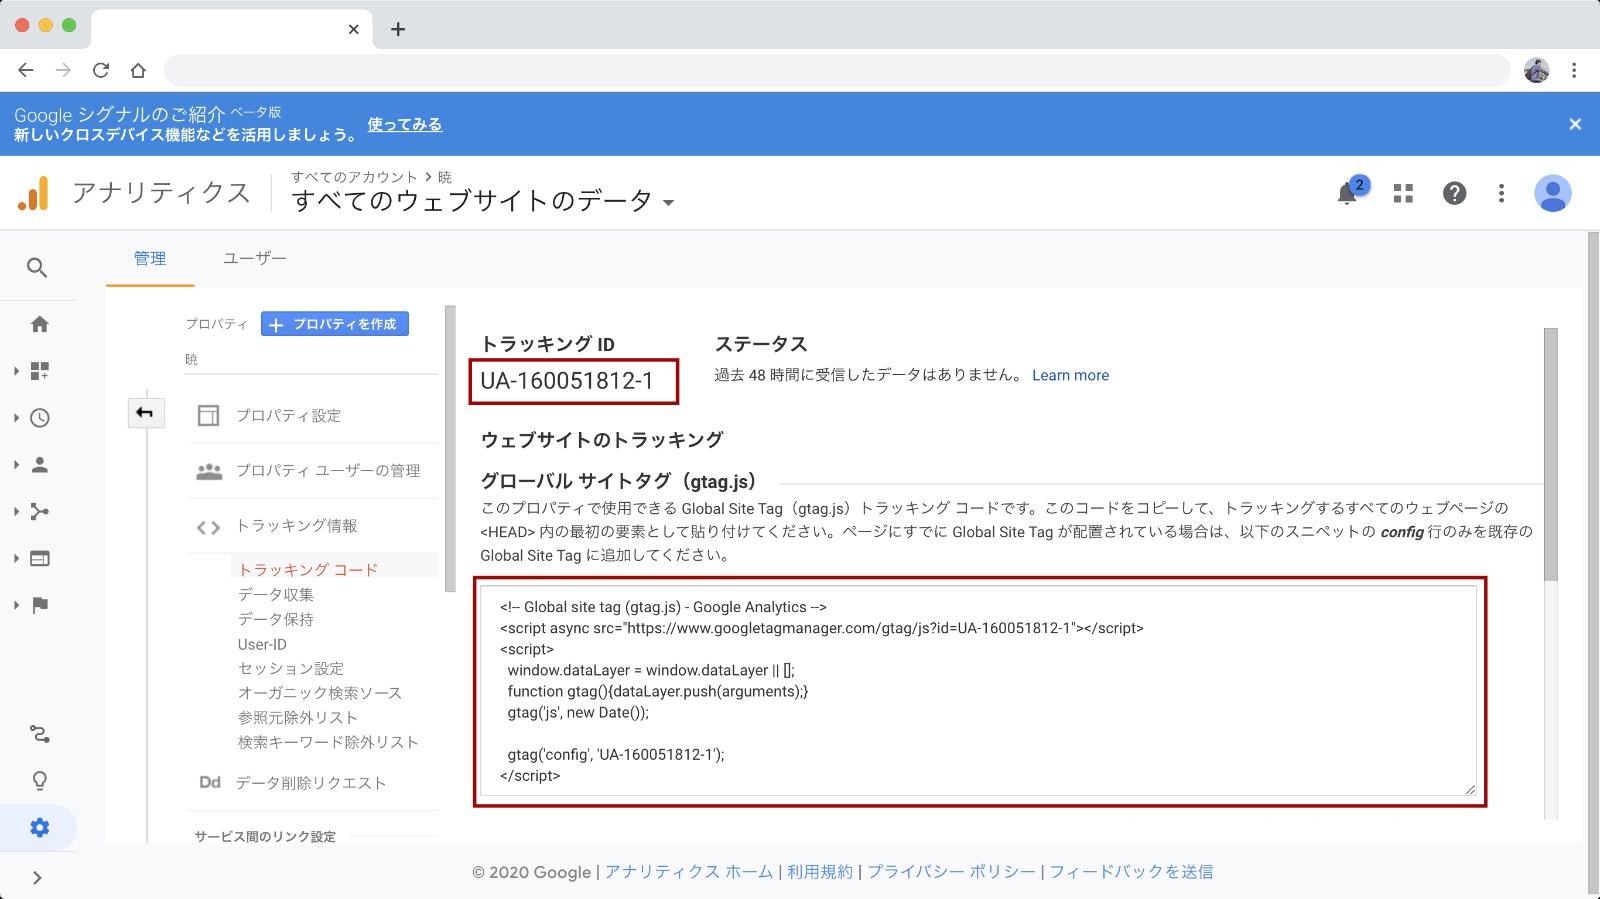 Google Analyticsのアクセス解析に必要な情報を取得できる